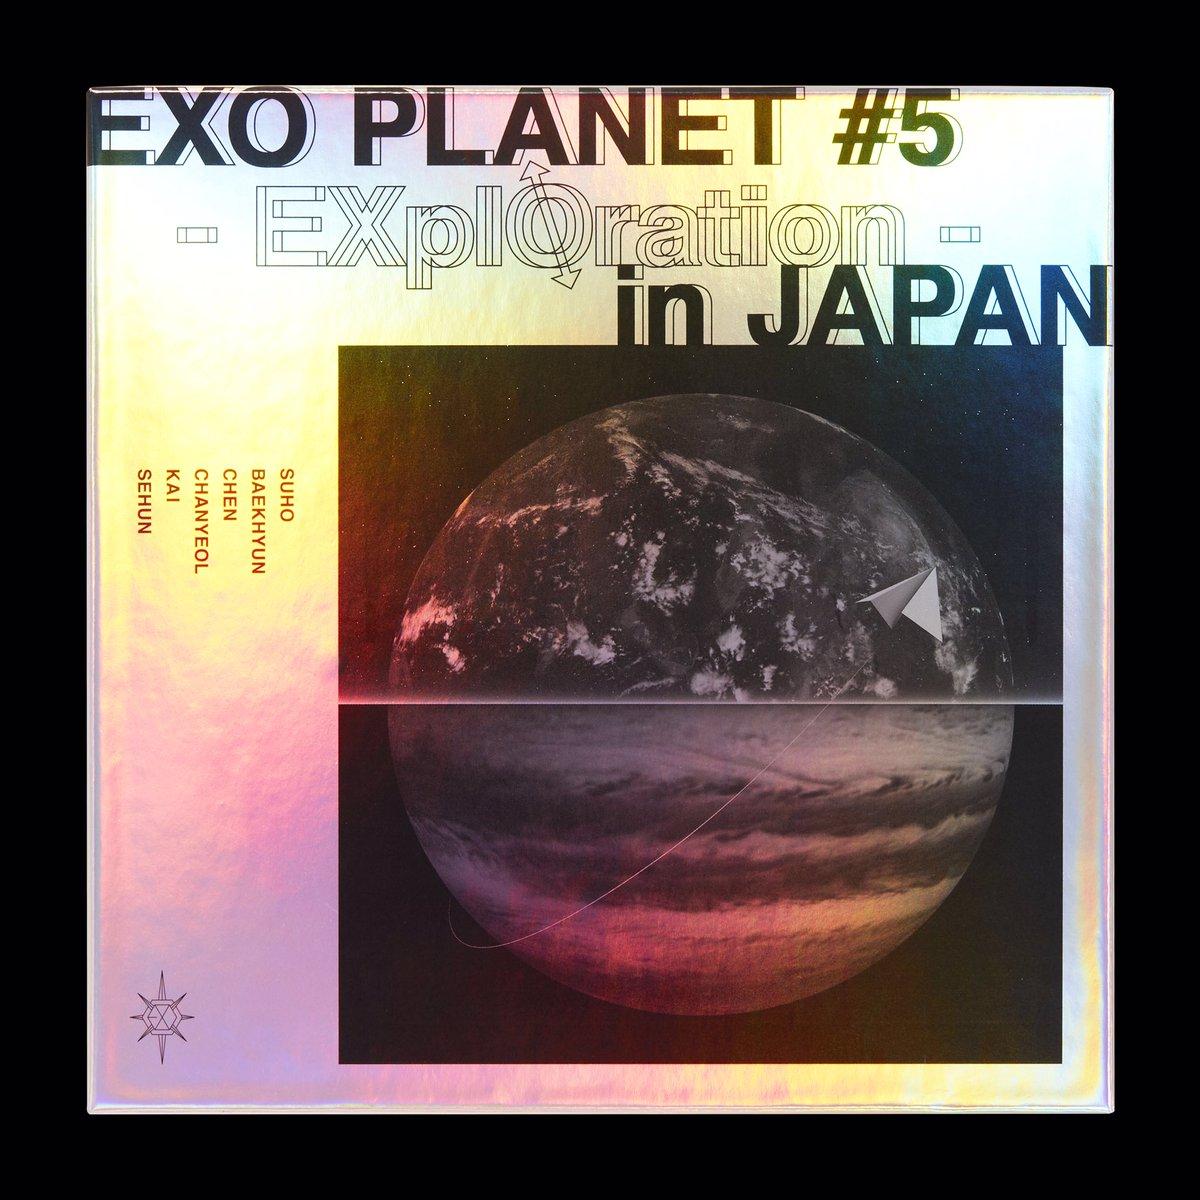 LIVE DVD&Blu-ray『EXO PLANET #5 - EXplOration - in JAPAN』本日リリース💿✨ 横浜アリーナ公演の模様を日本オリジナルの新曲「BIRD」含む全26曲完全収録!皆さん一緒に歌っていただきありがとうございました🕊✨ DVD&Blu-rayでもお楽しみください! #EXO We are one👍 exo-jp.net/discography/